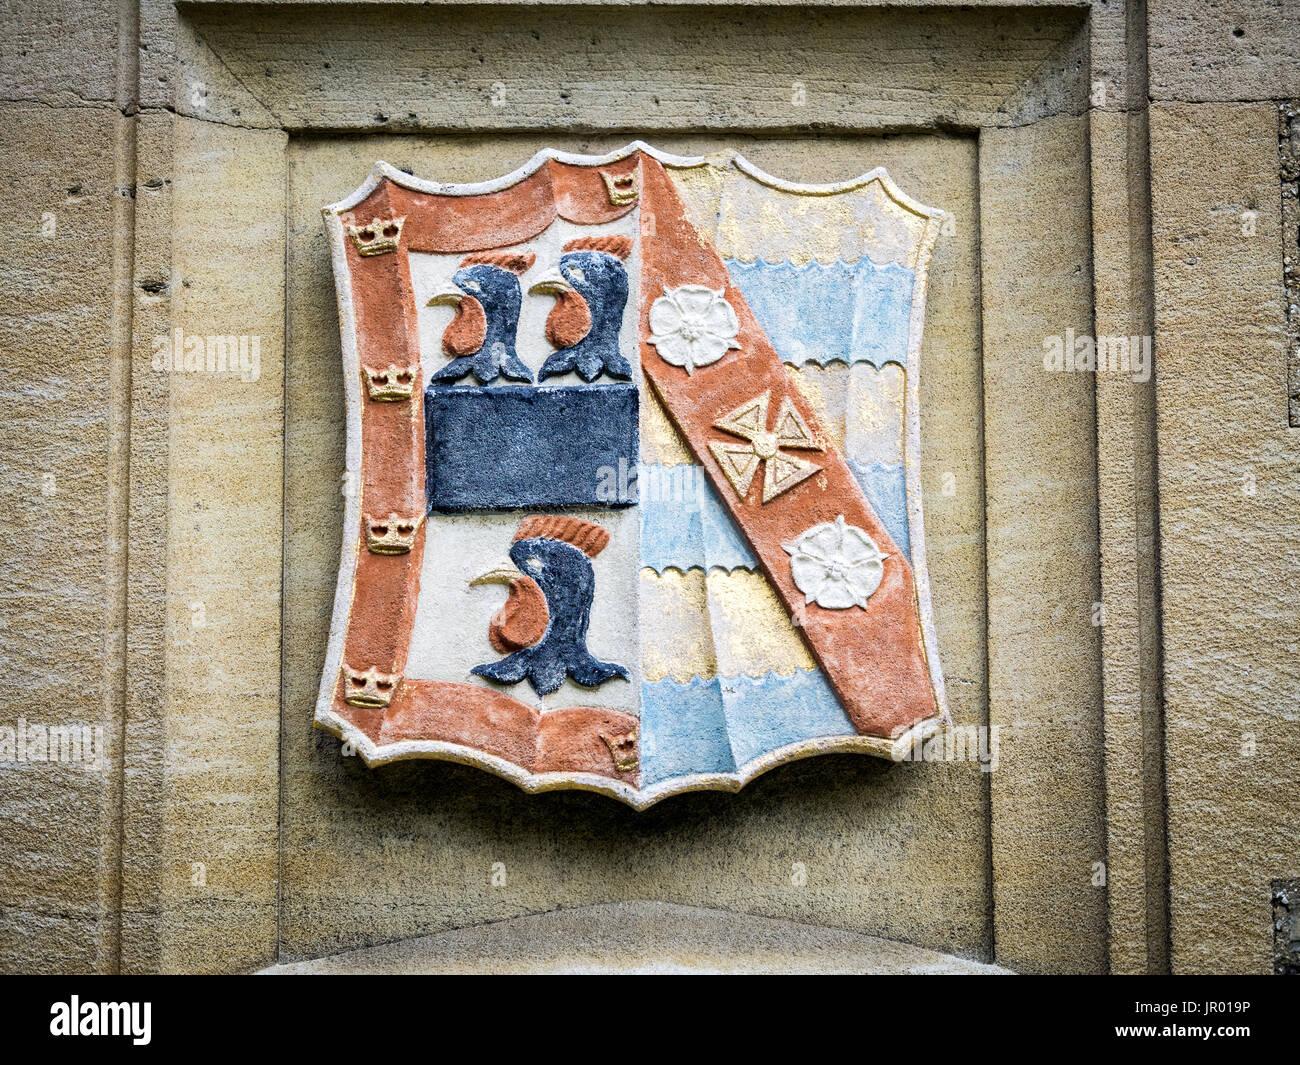 Jesus College Cambridge - Coat of Arms of Jesus College, part of the University of Cambridge, UK Stock Photo